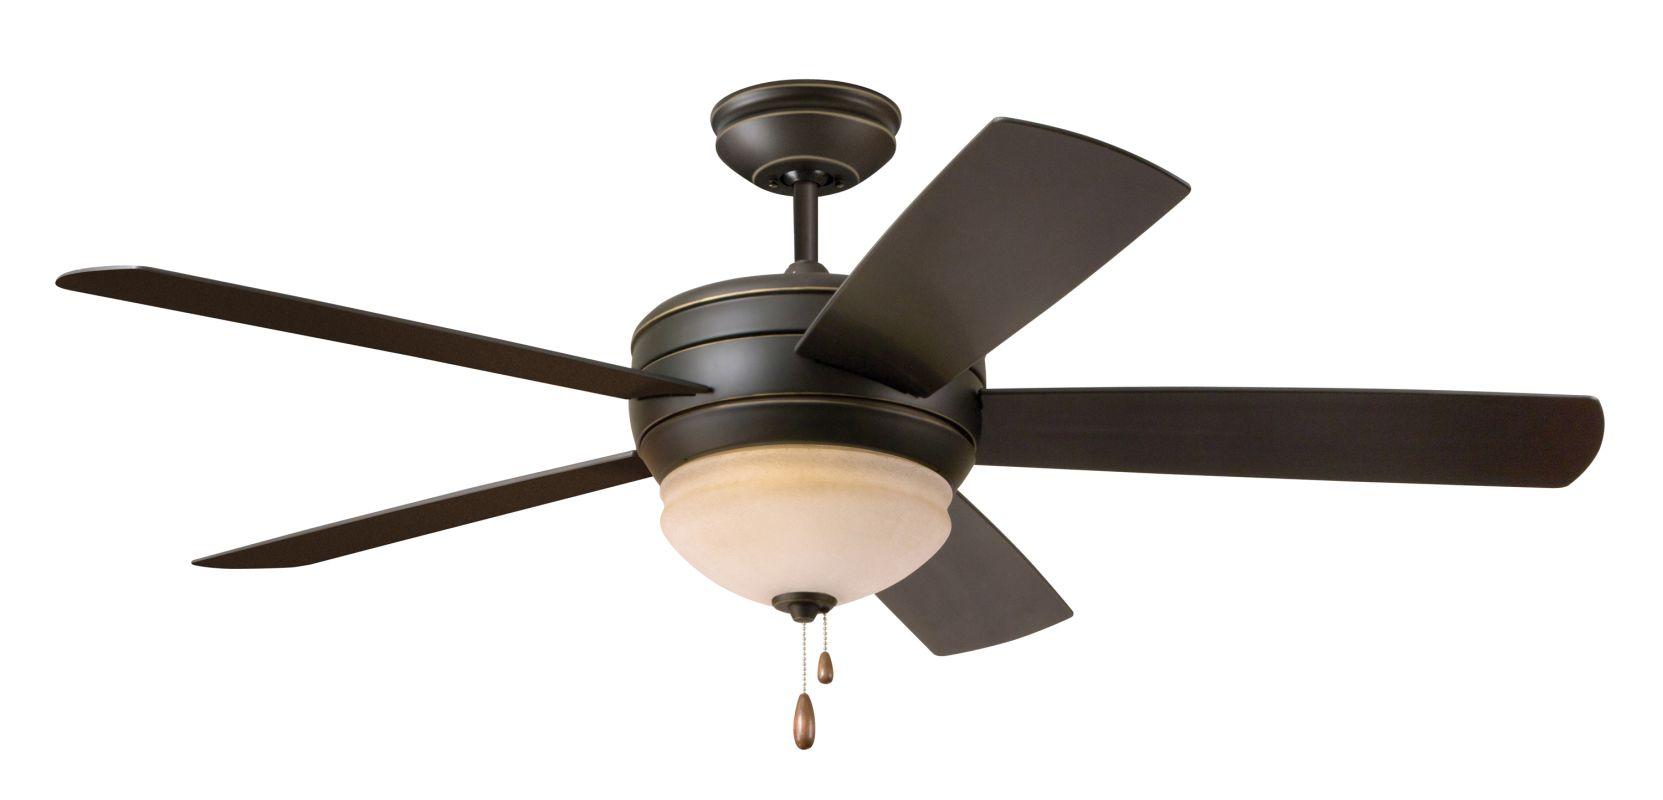 Emerson Cf850ges Golden Espresso Summerhaven 52 Quot 5 Blade Outdoor Ceiling Fan Blades And Light